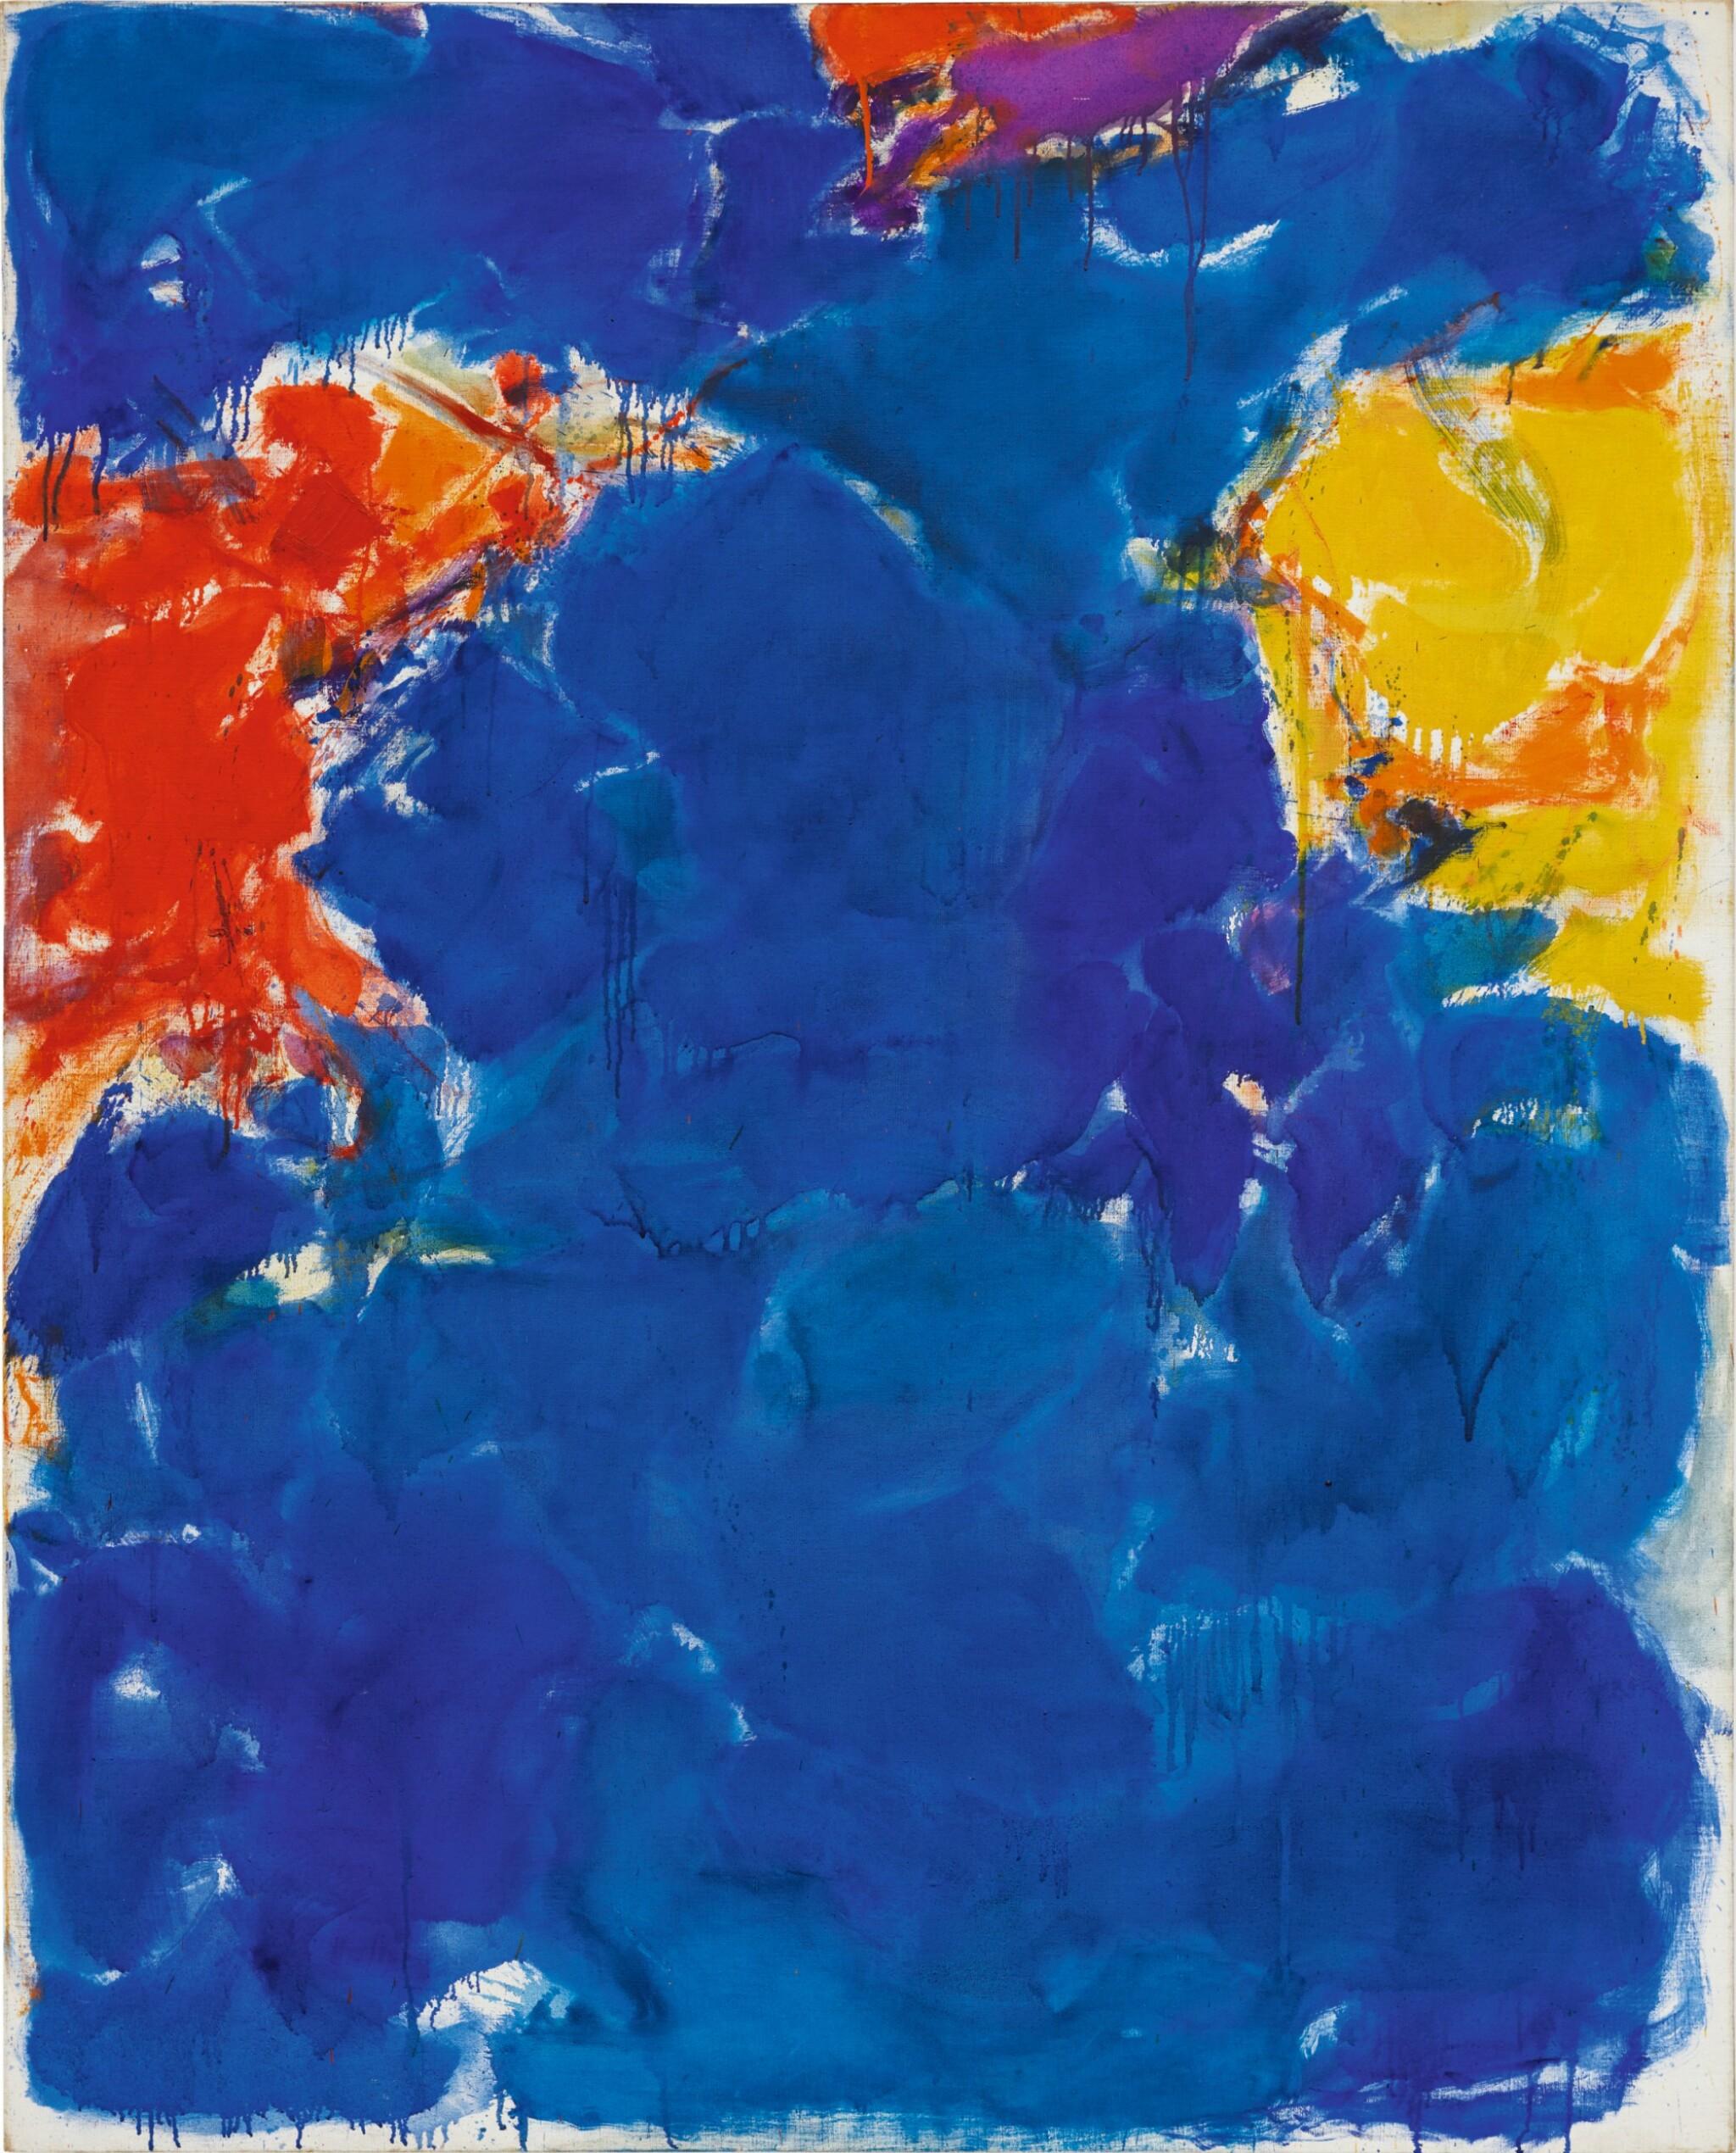 SAM FRANCIS | DEEP BLUE, YELLOW, RED